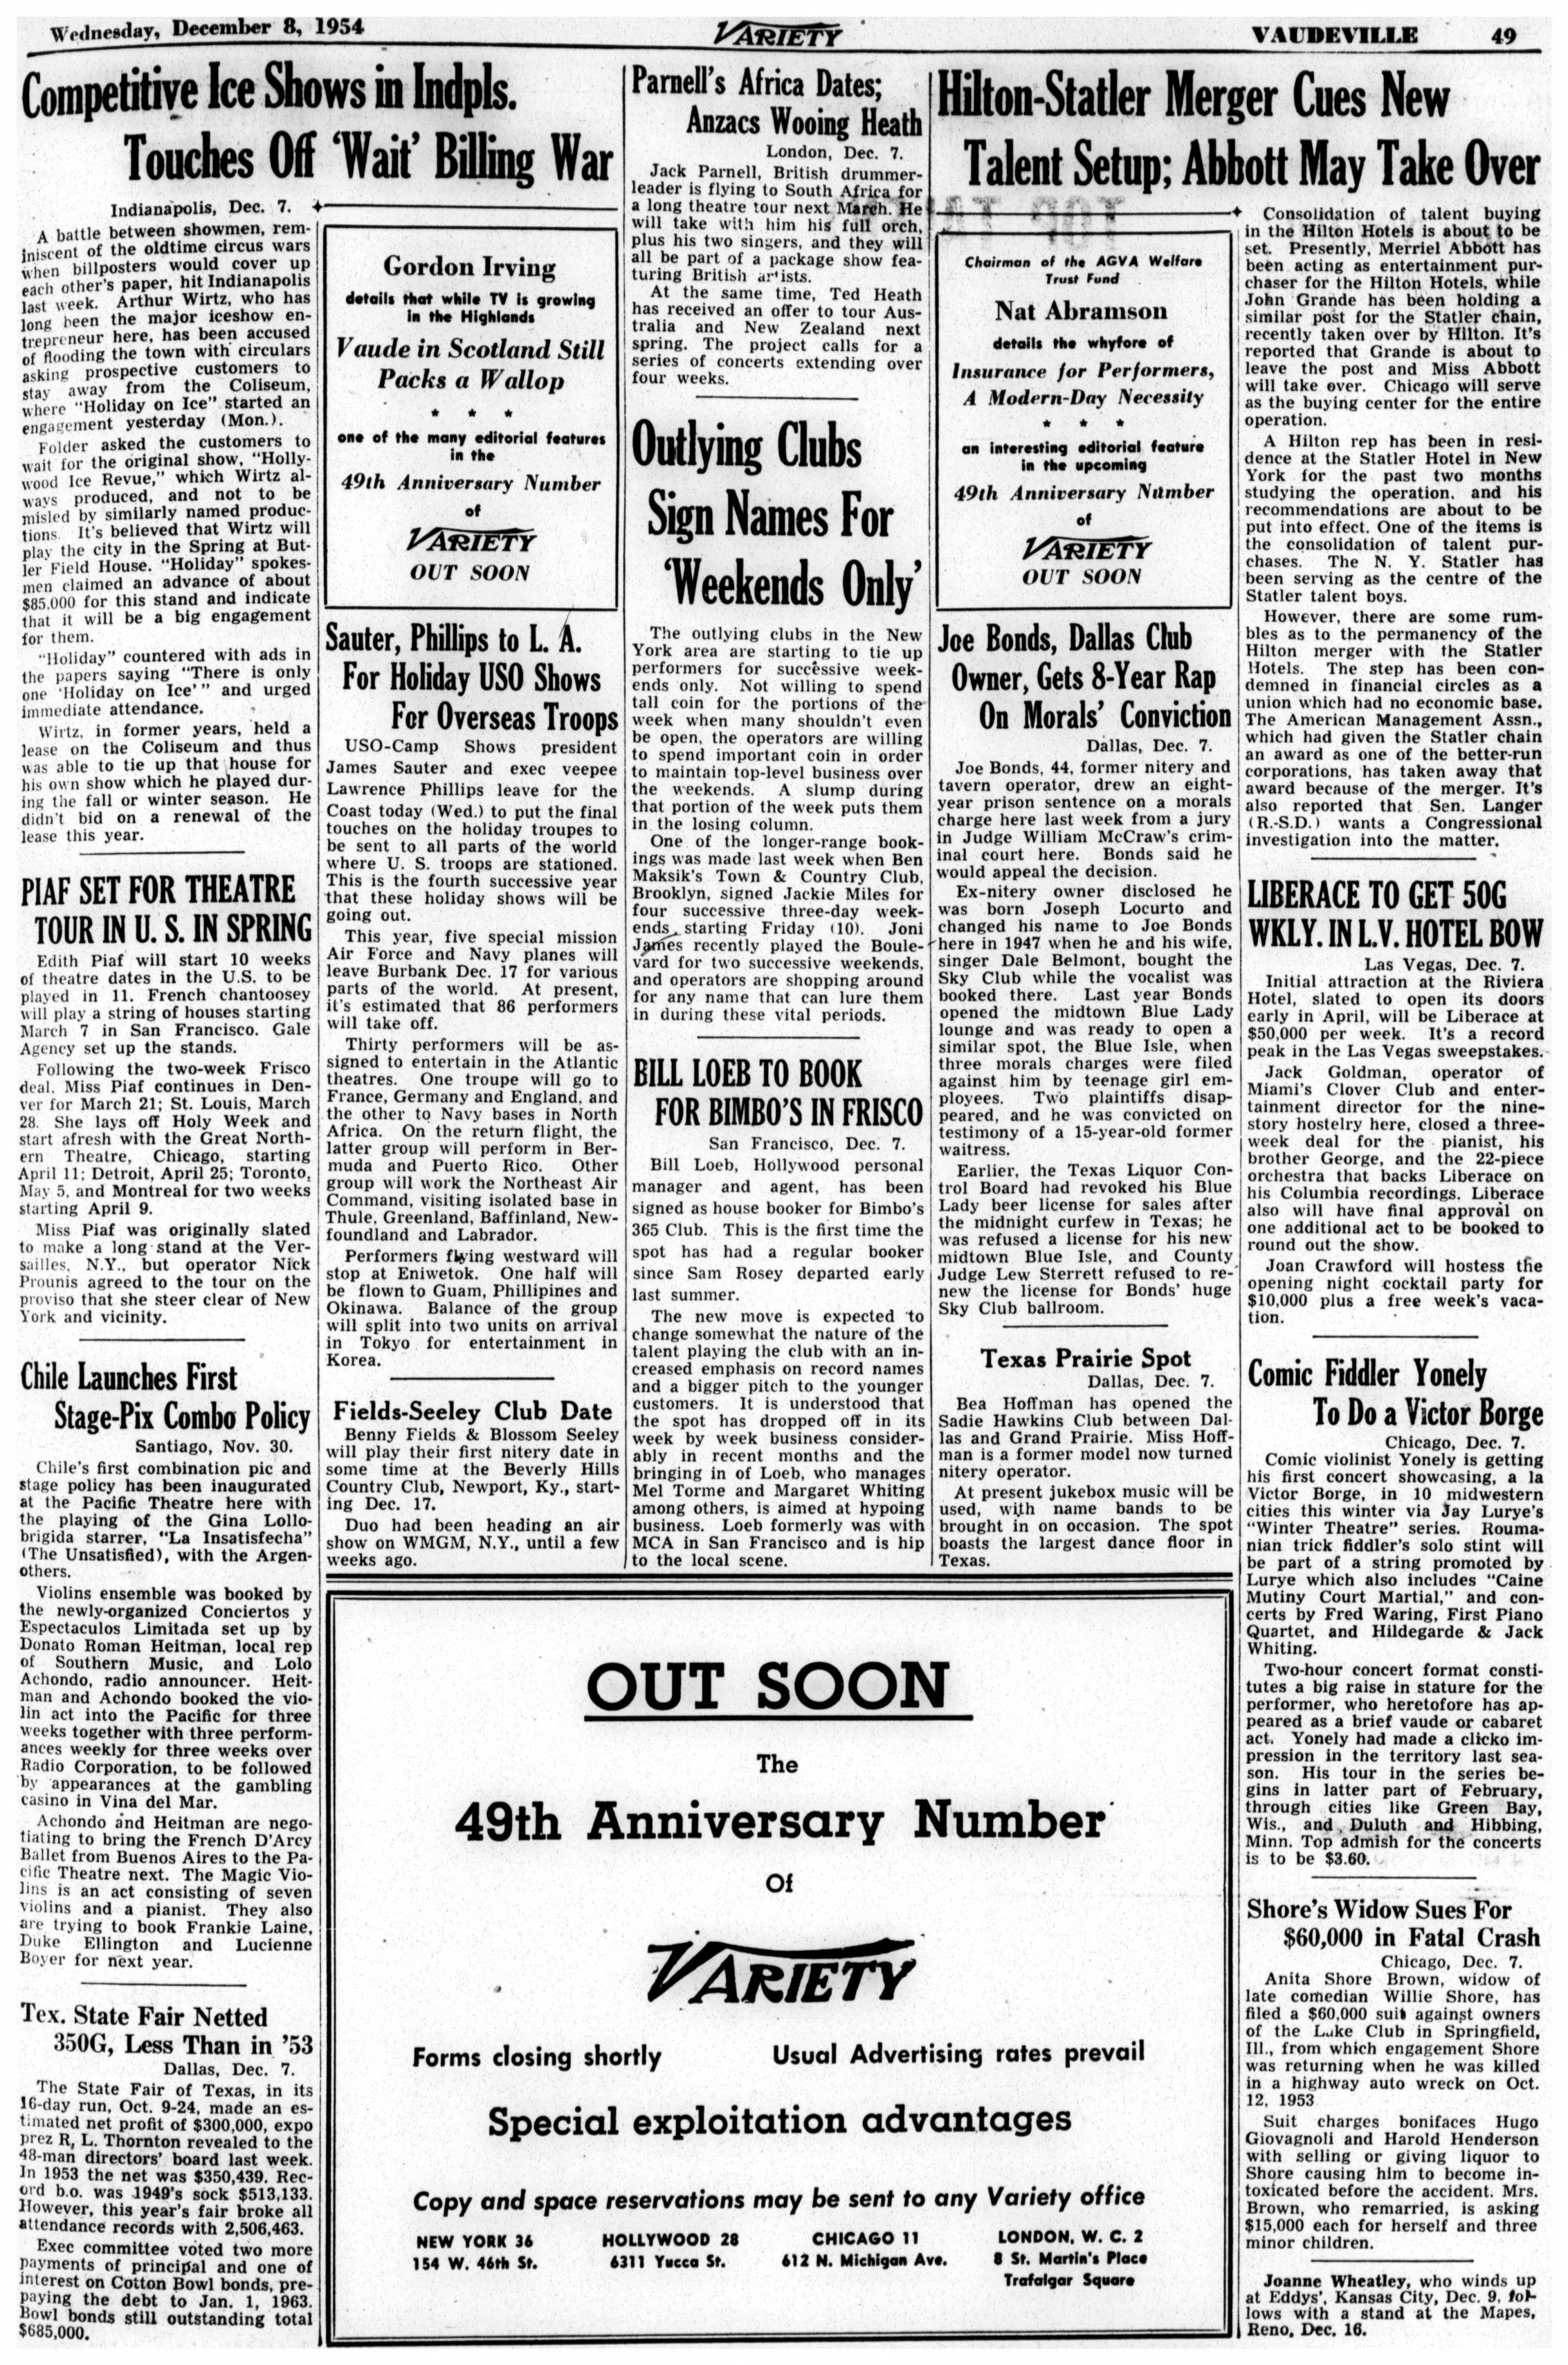 Variety196-1954-12_jp2.zip&file=variety196-1954-12_jp2%2fvariety196-1954-12_0128